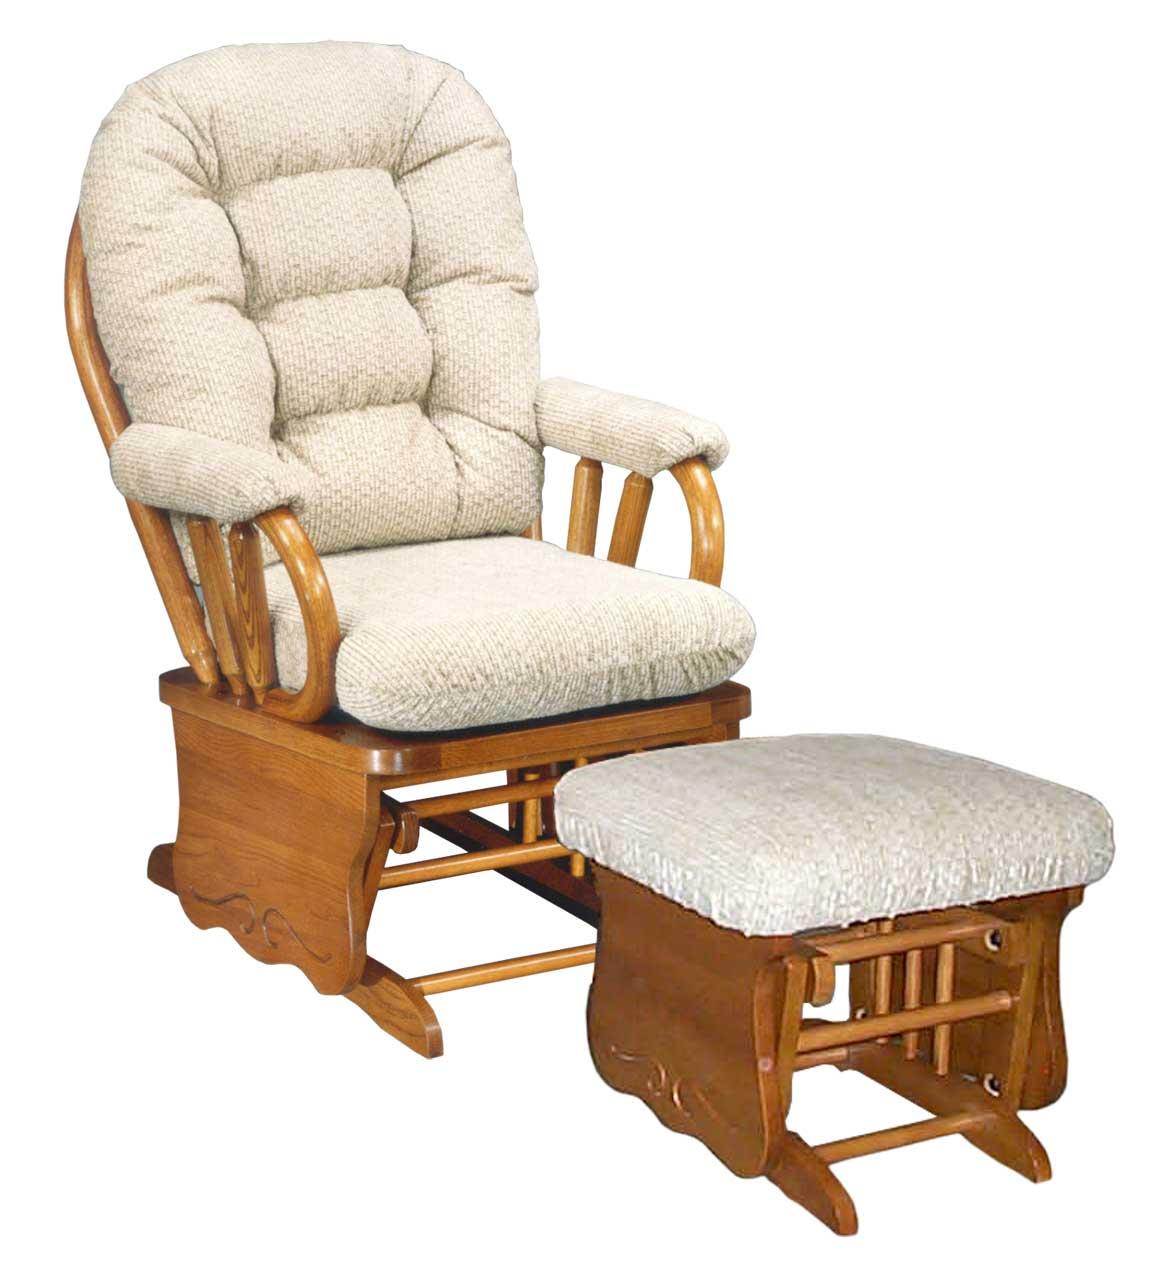 Small Swivel Barrel Chairs